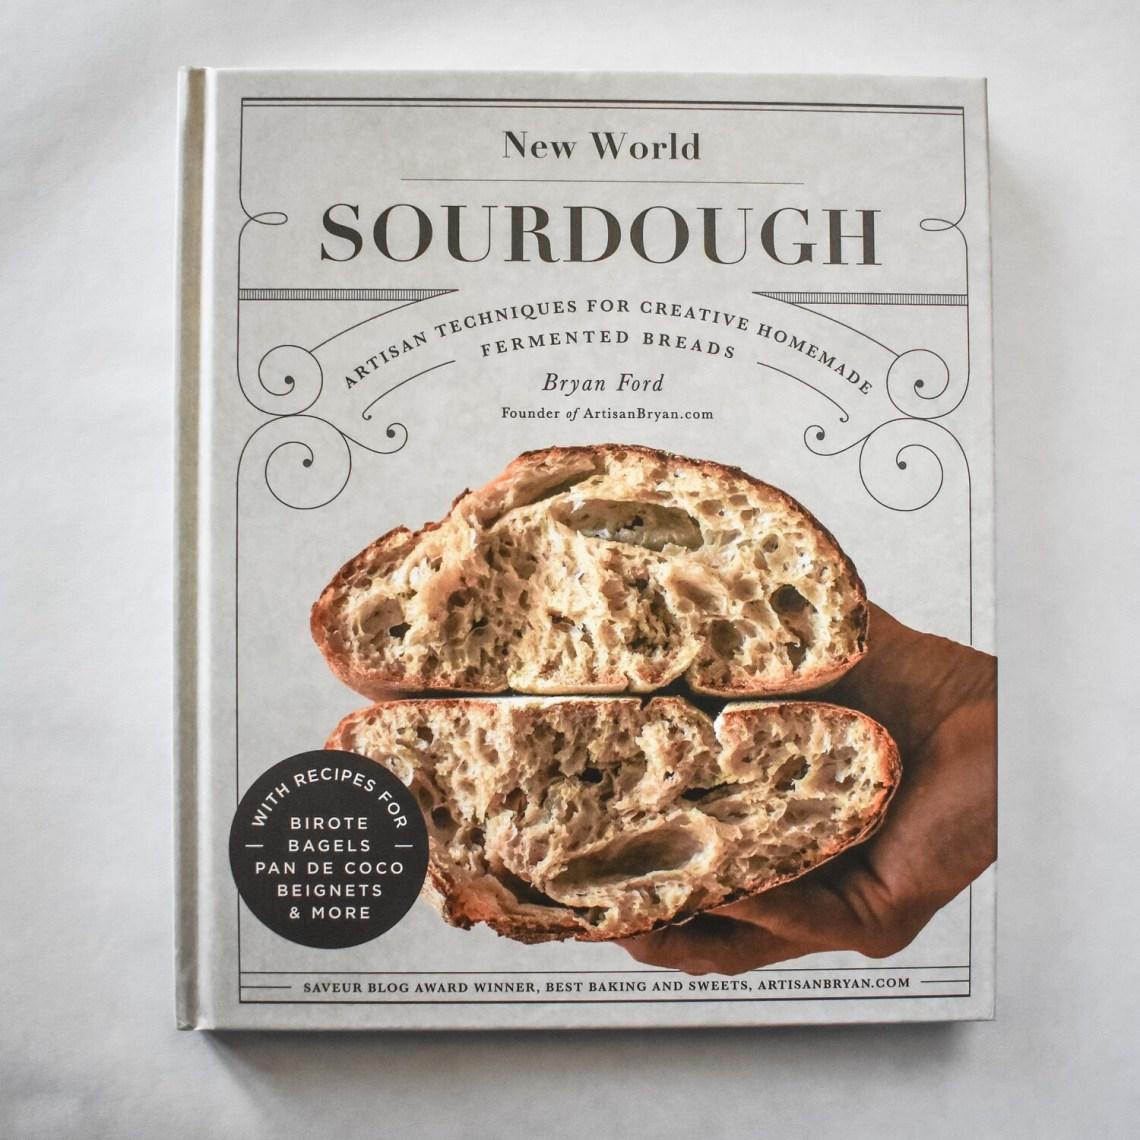 New World Sourdough - by Bryan Ford